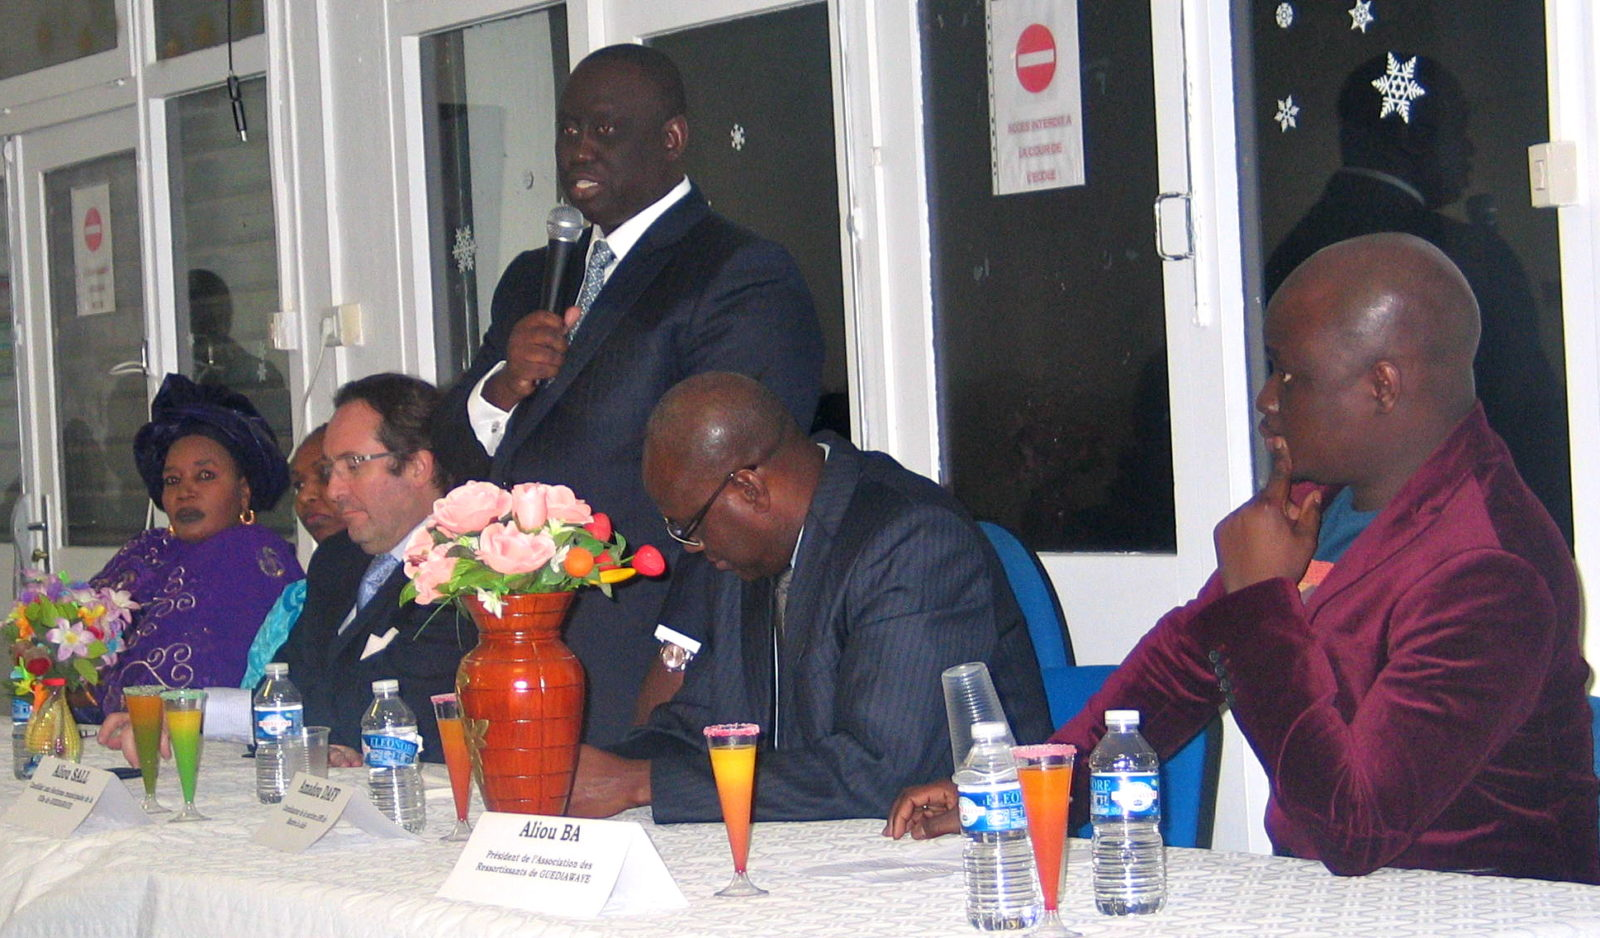 Mantes-la-Jolie (Yvelines), samedi 1 mars 2014 - Aliou Sall s'adresse aux ressortissants sénégalais (MA/Ab.N)